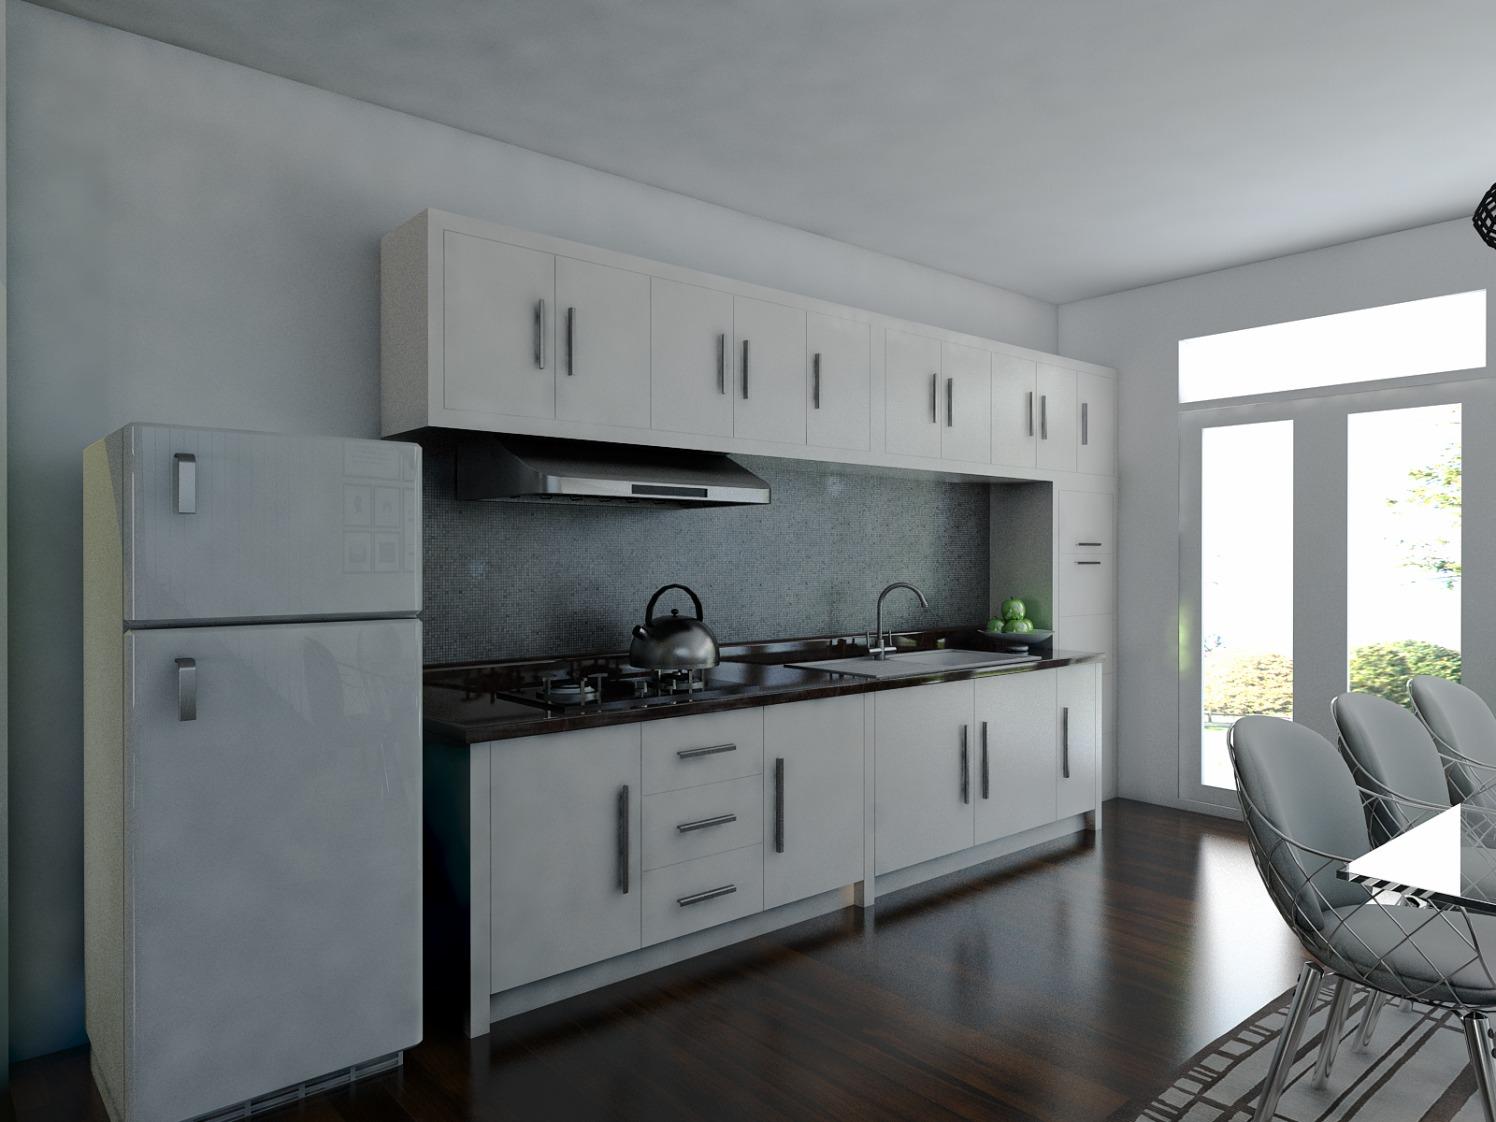 Blended White by hardik vartak Modern | Interior Design Photos & Ideas